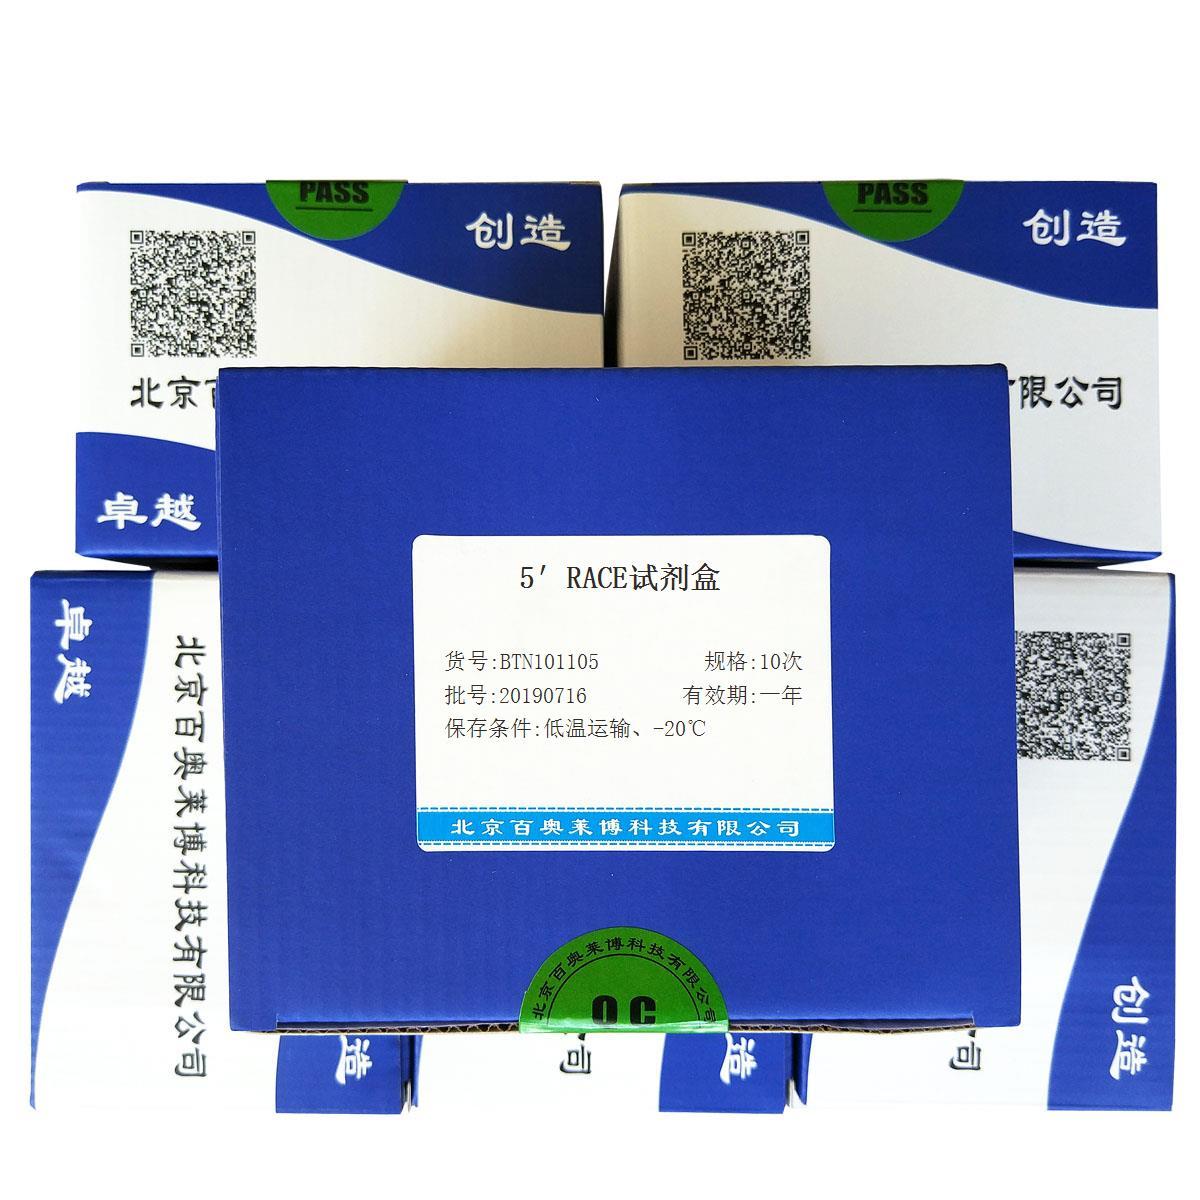 5′RACE试剂盒北京厂家